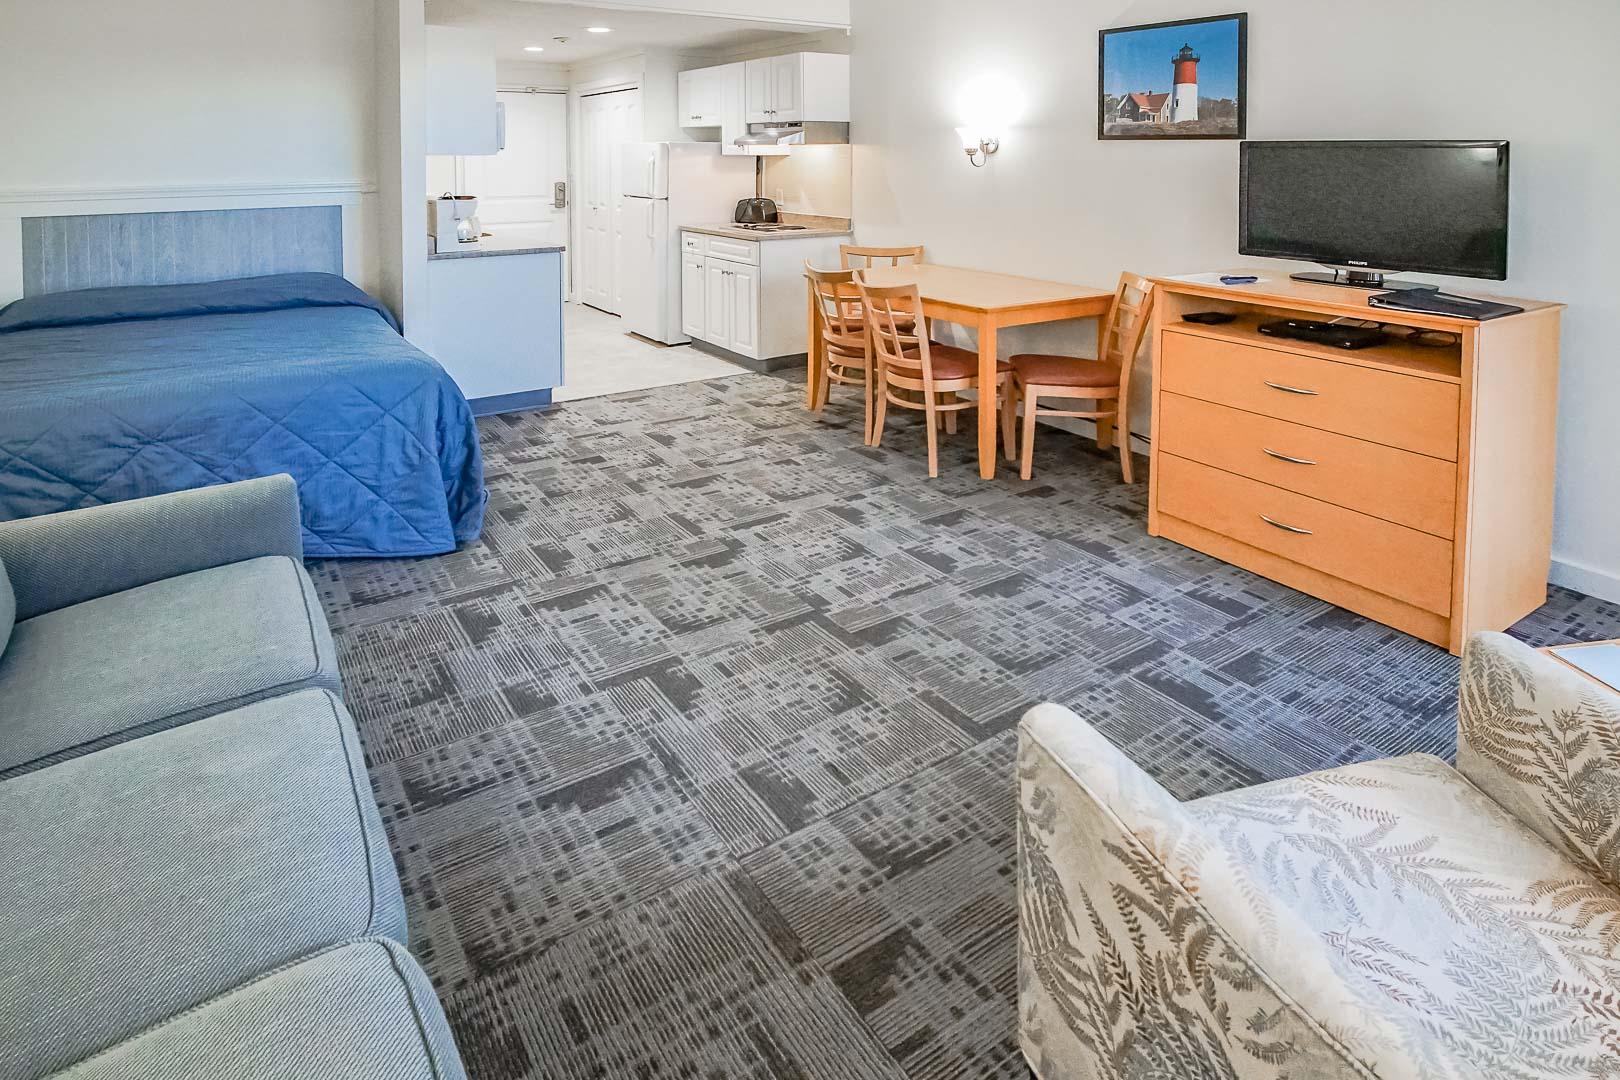 A cozy Studio accommodation at VRI's Courtyard Resort in Massachusetts.